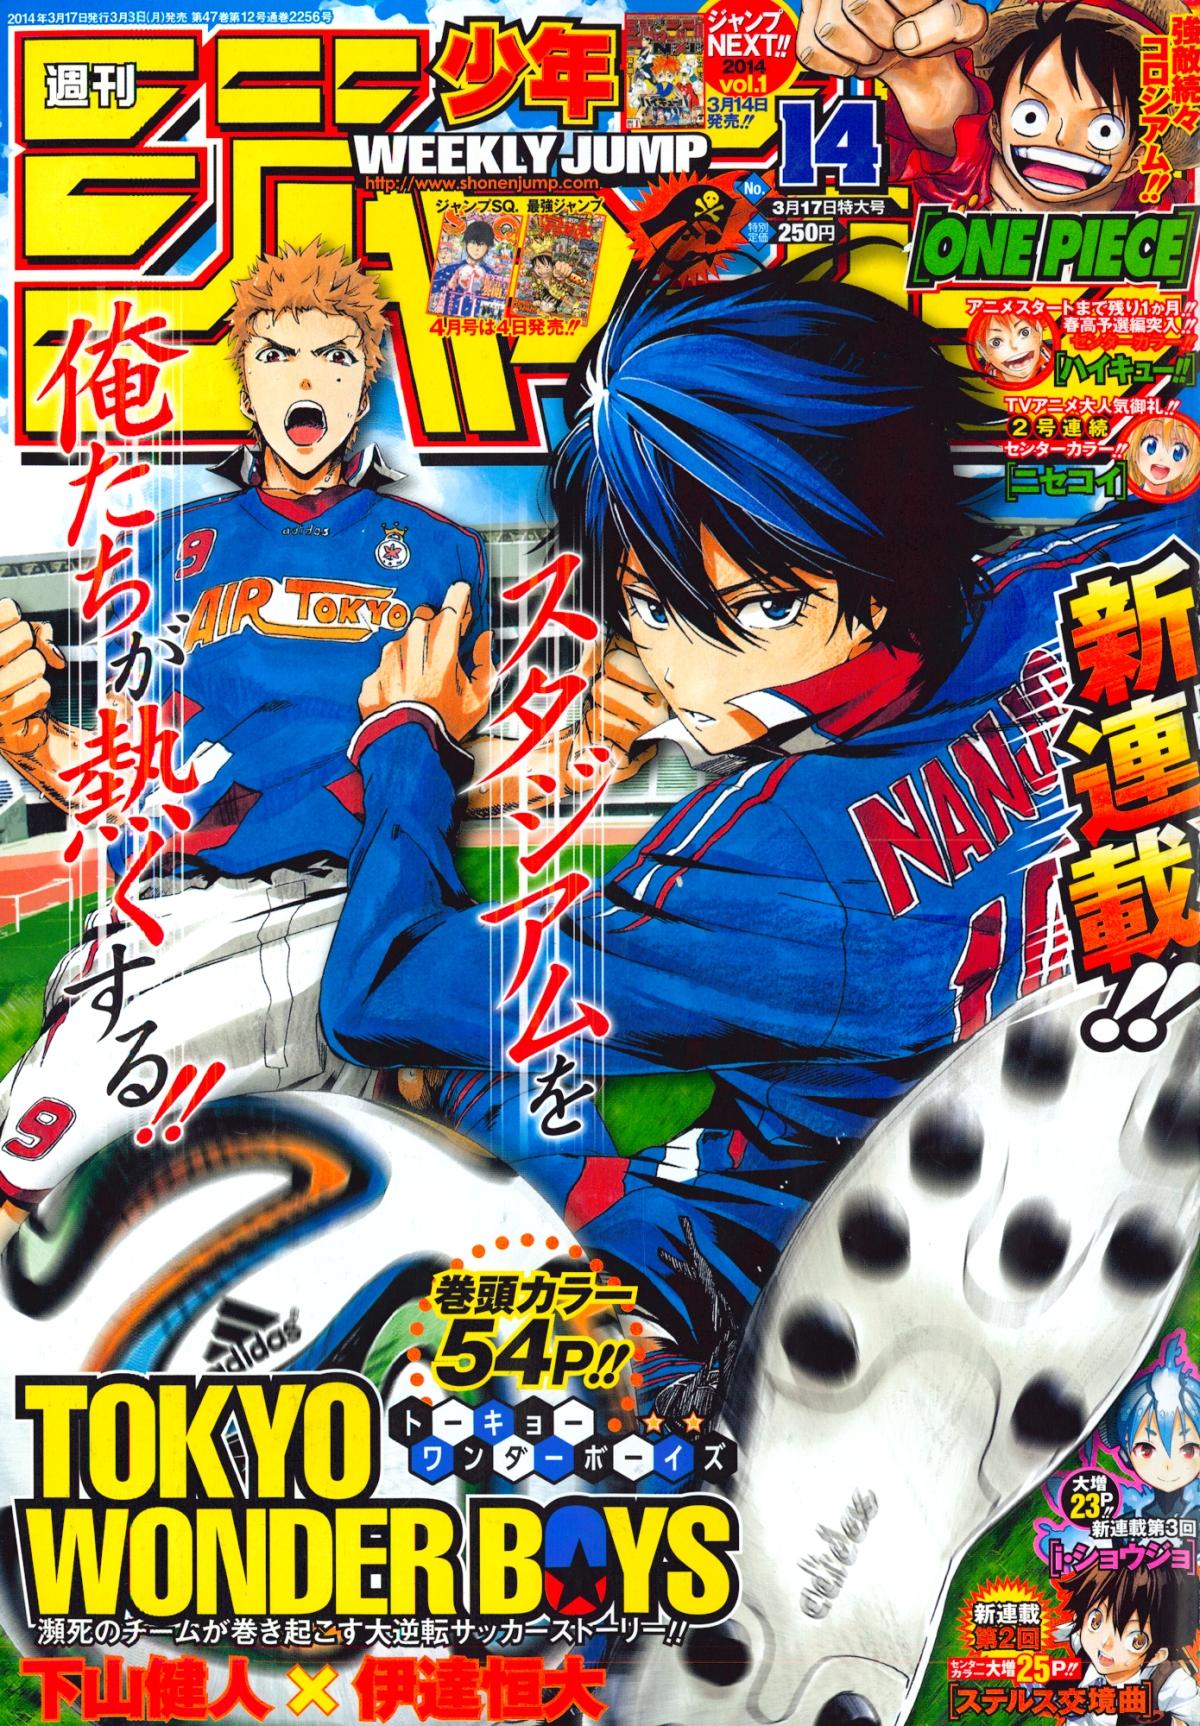 Weekly Shonen Jump 2014 #14